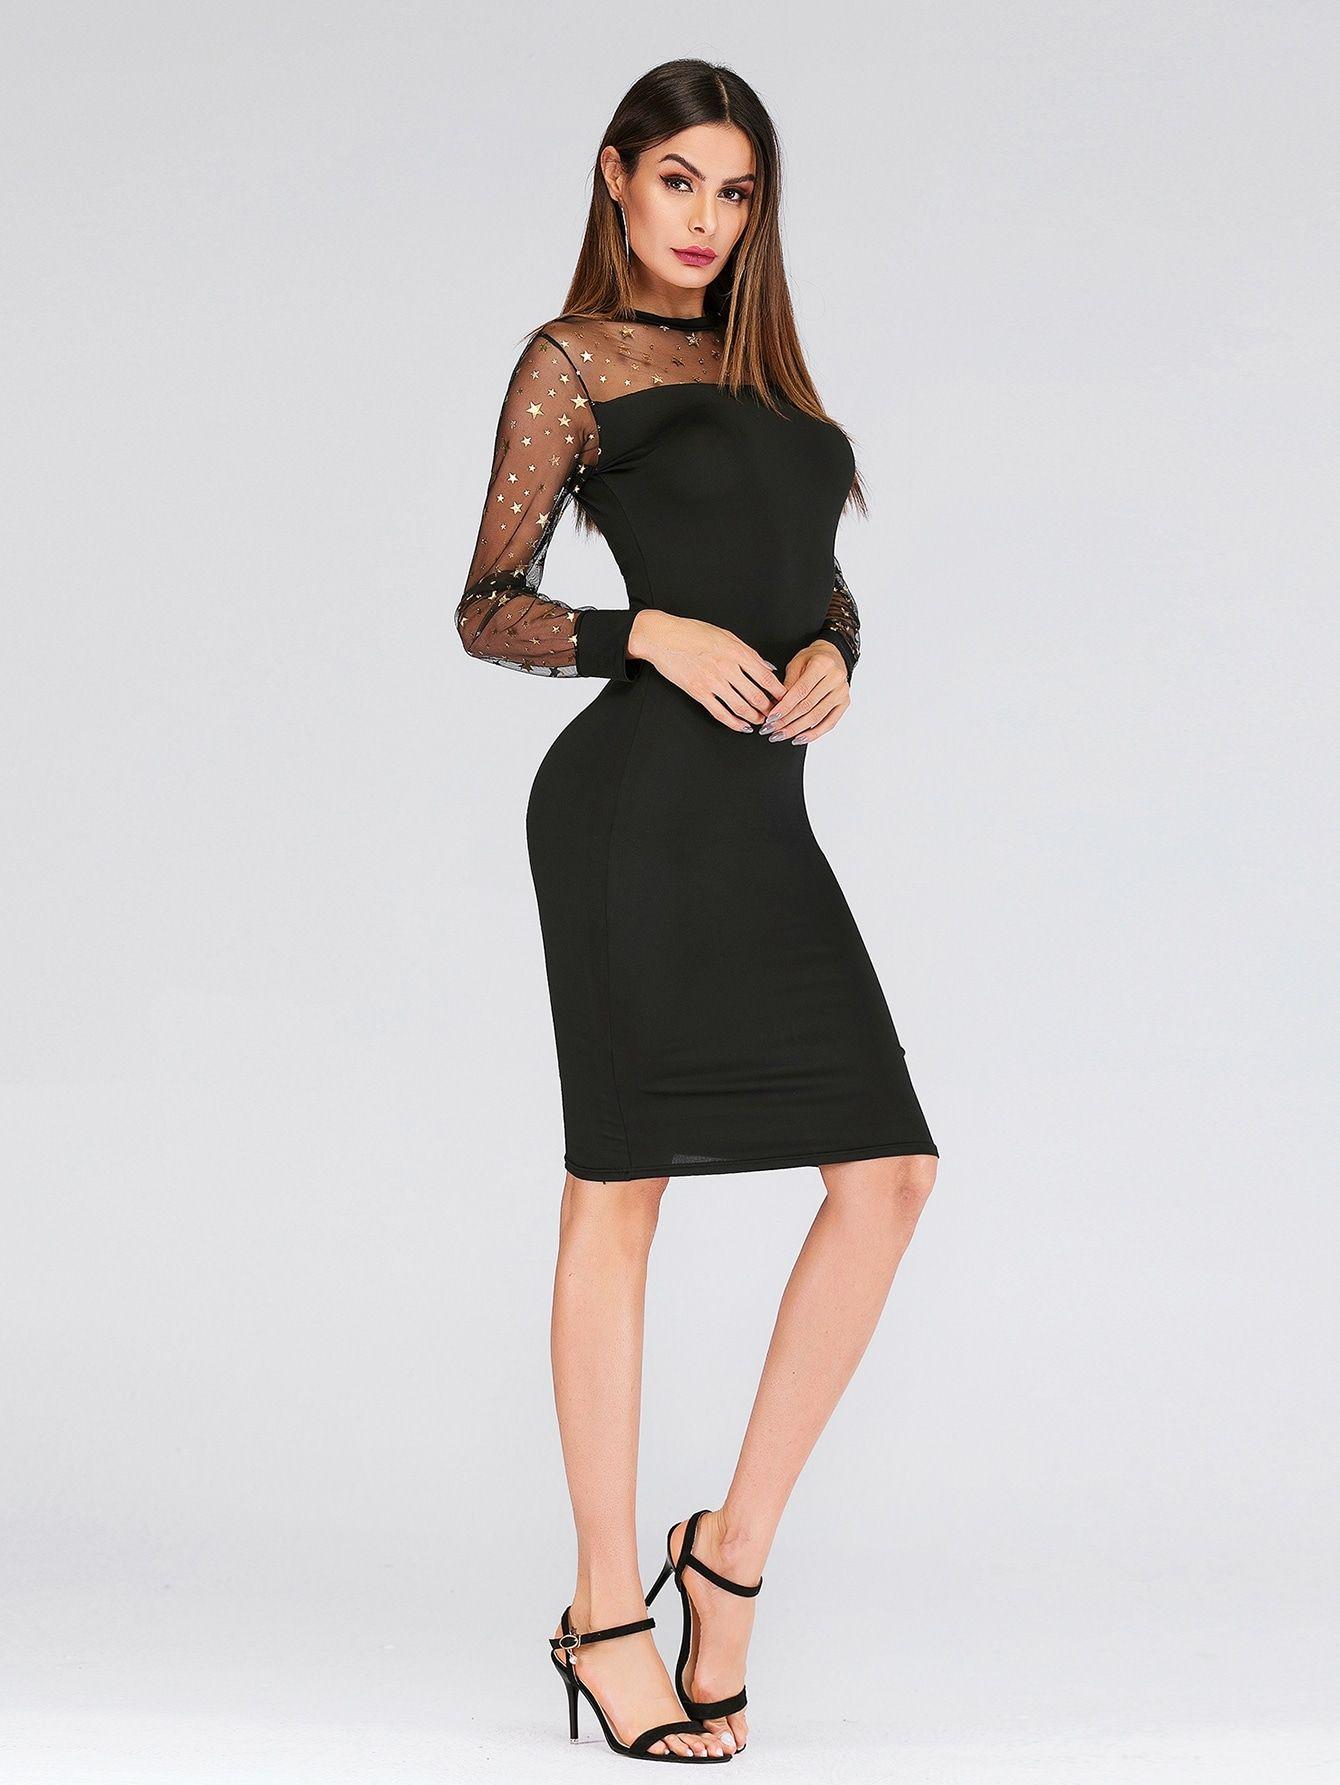 cd0b65eff2a7 Party Pencil Contrast Mesh Geometric Bodycon Round Neck Long Sleeve Natural  Black Knee Length Contrast Mesh Star Print Dress